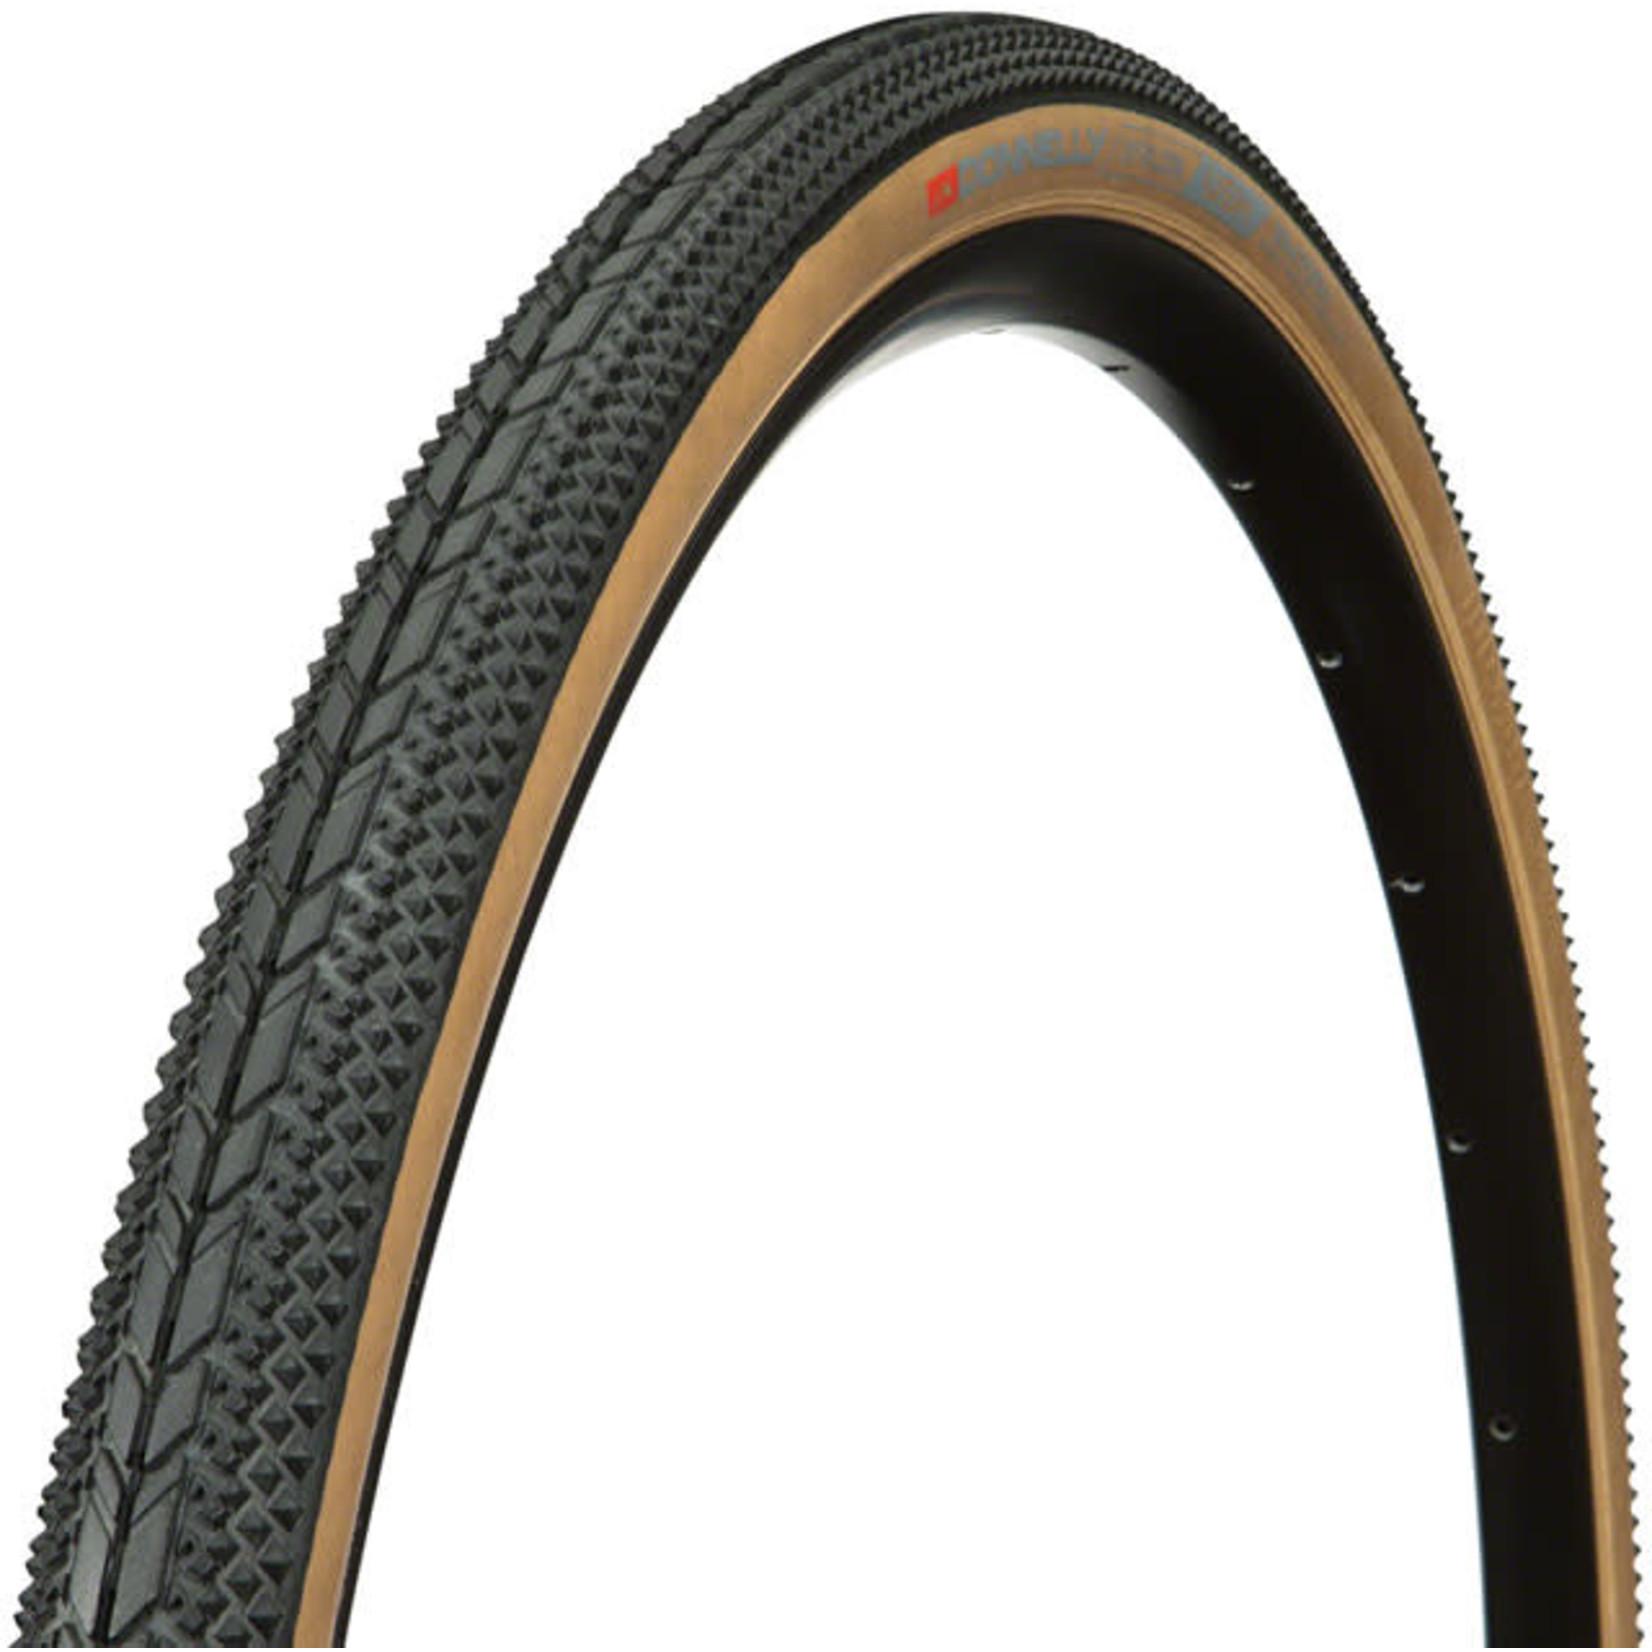 Donnelly Sports Donnelly Sports X'Plor USH Tire - 700 x 35, Clincher, Folding, Black/Tan, 60tpi